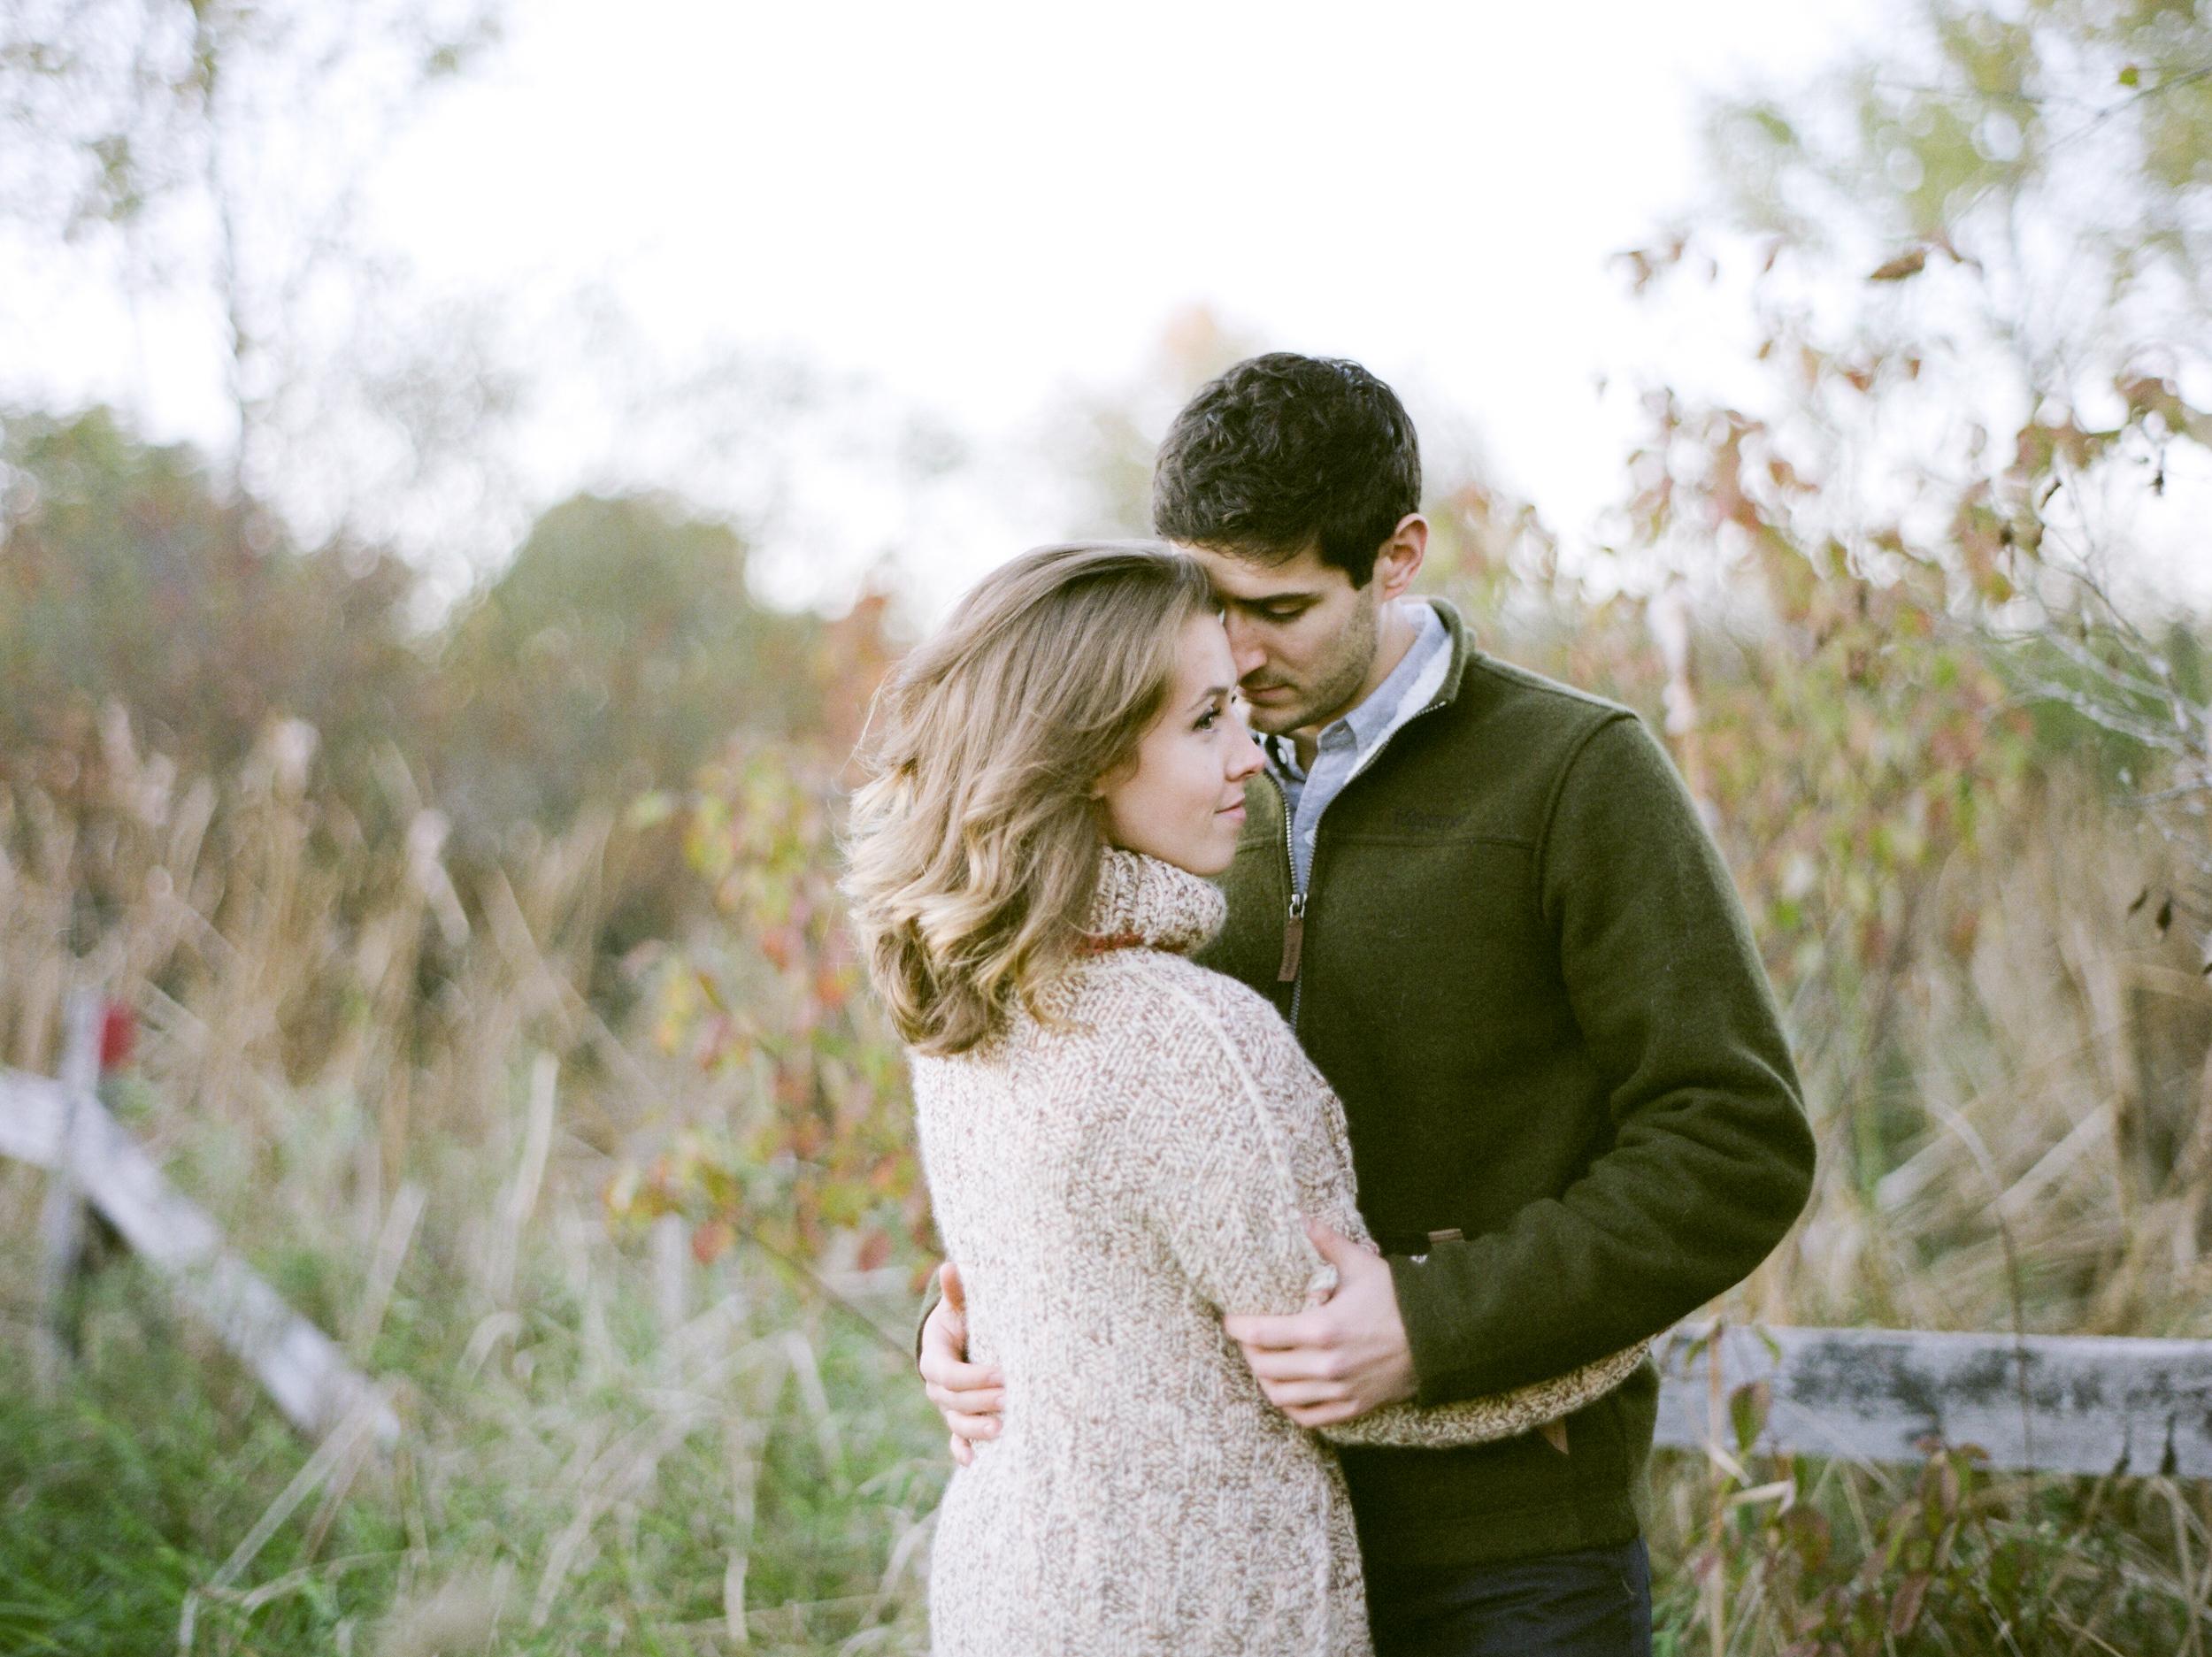 Autumn New England engagement portraits